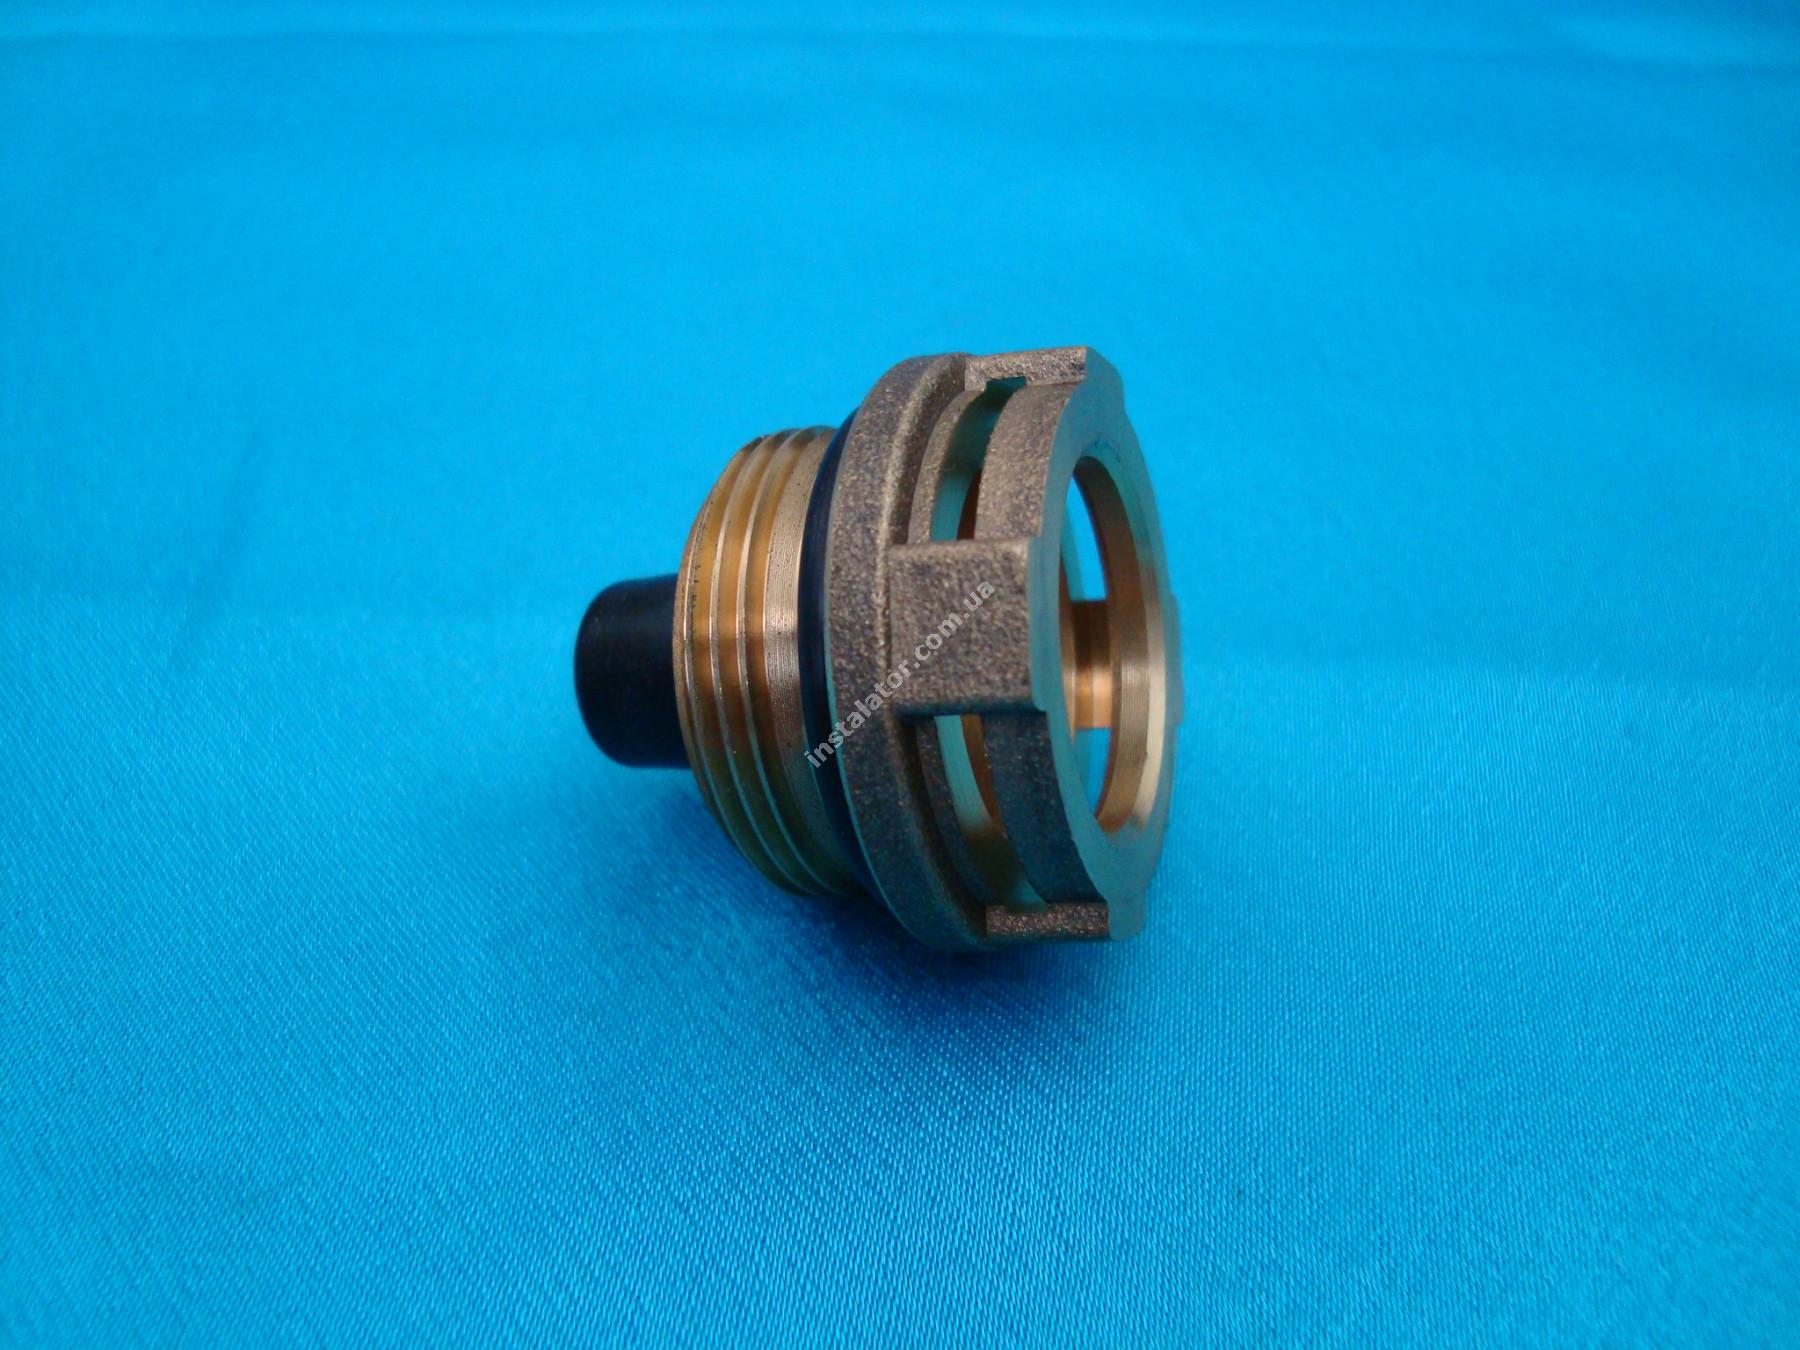 600750 Втулка 3-х ходового клапана FUGAS full-image-2